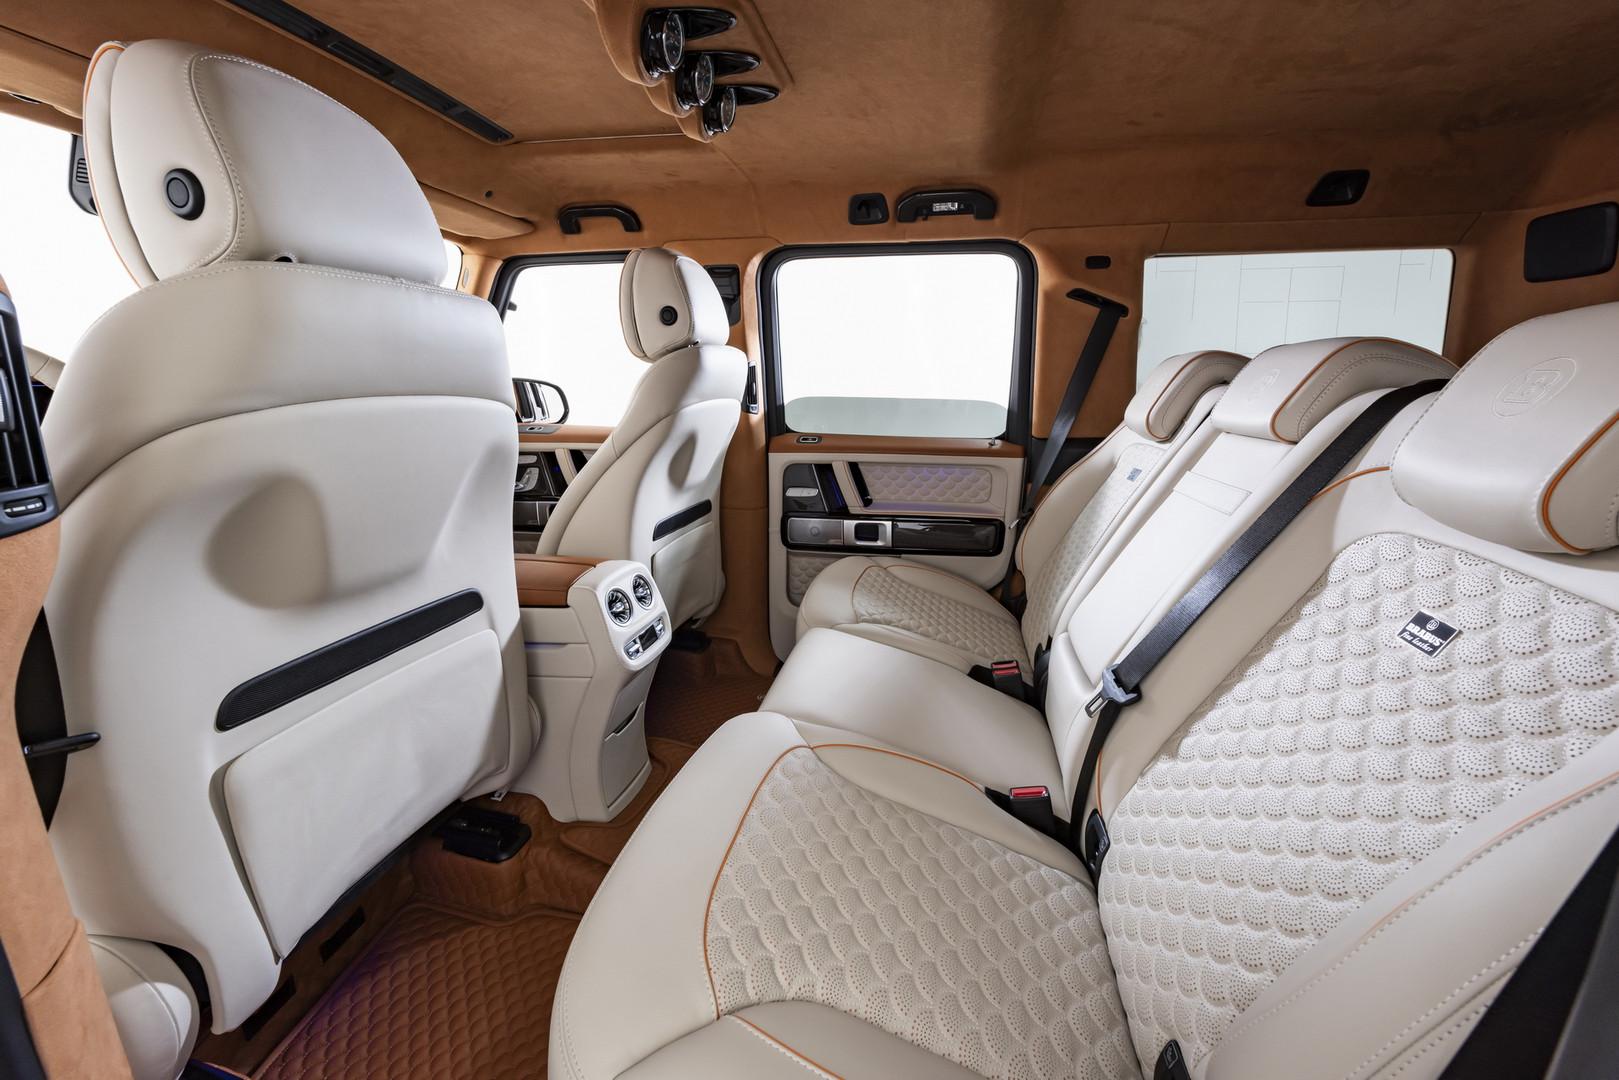 Brabus V12 900 Rear Seats